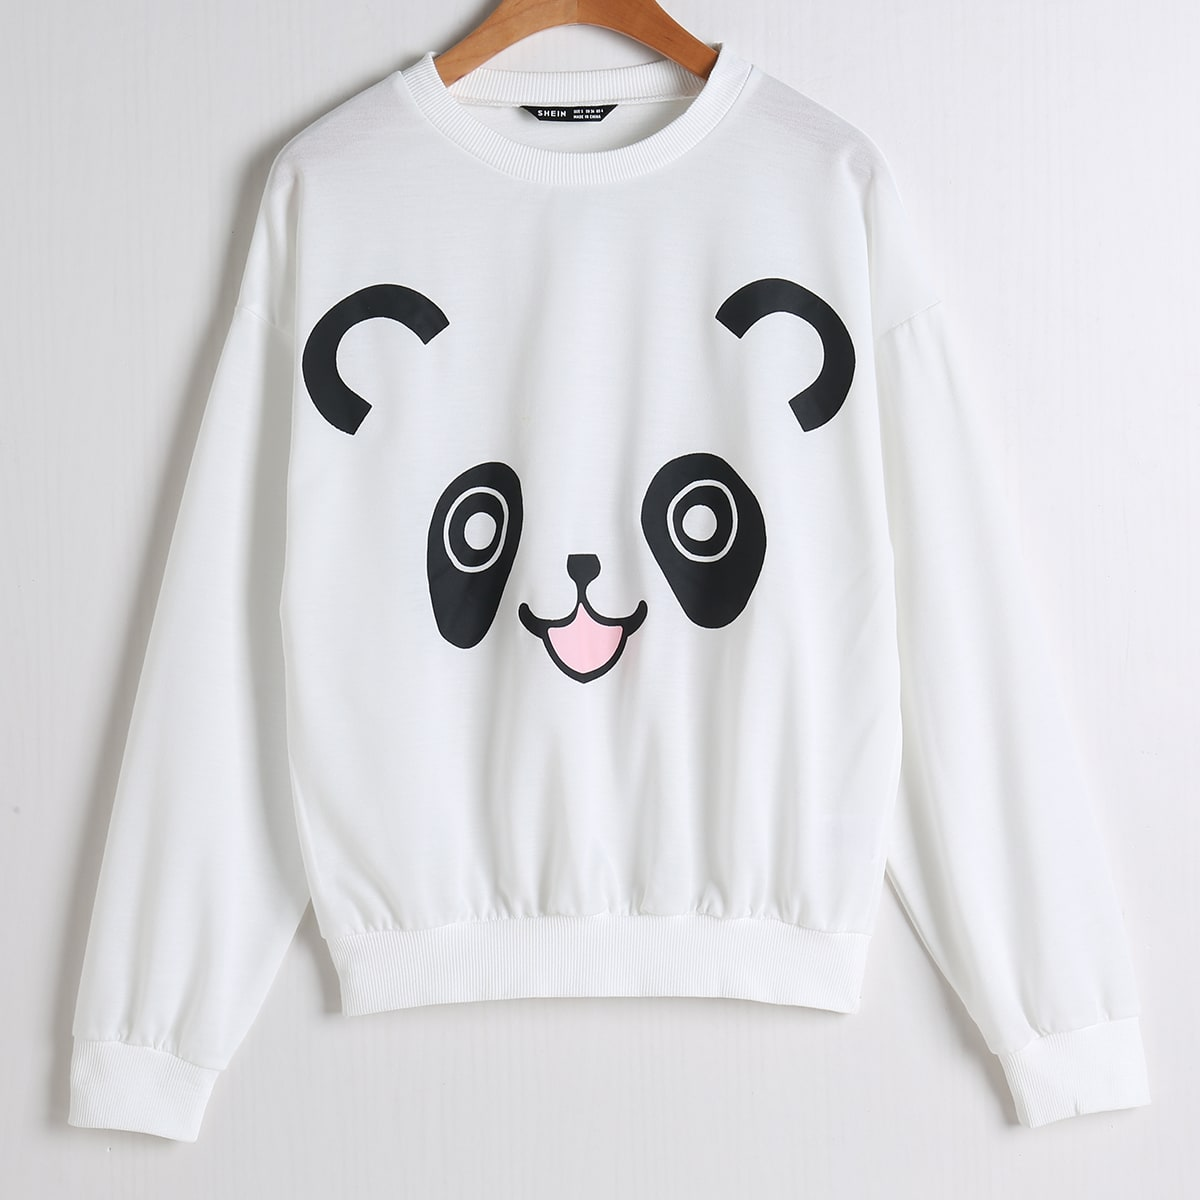 SHEIN / Cartoon Graphic Drop Shoulder Sweatshirt